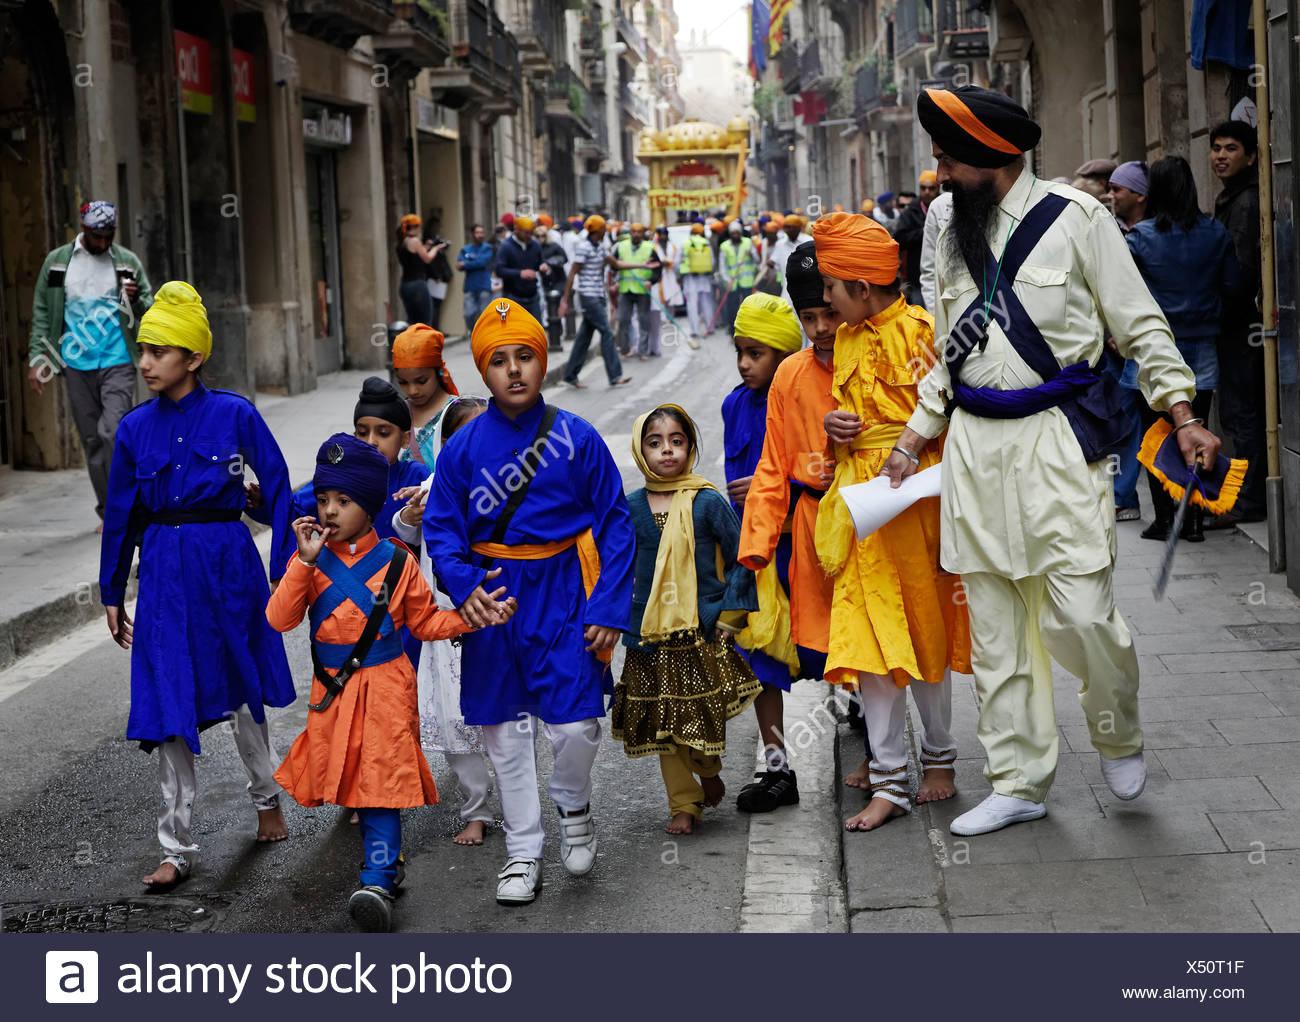 An Indian festival, Vaisakhi, in Barcelona's Rambla de Catalunya area. - Stock Image